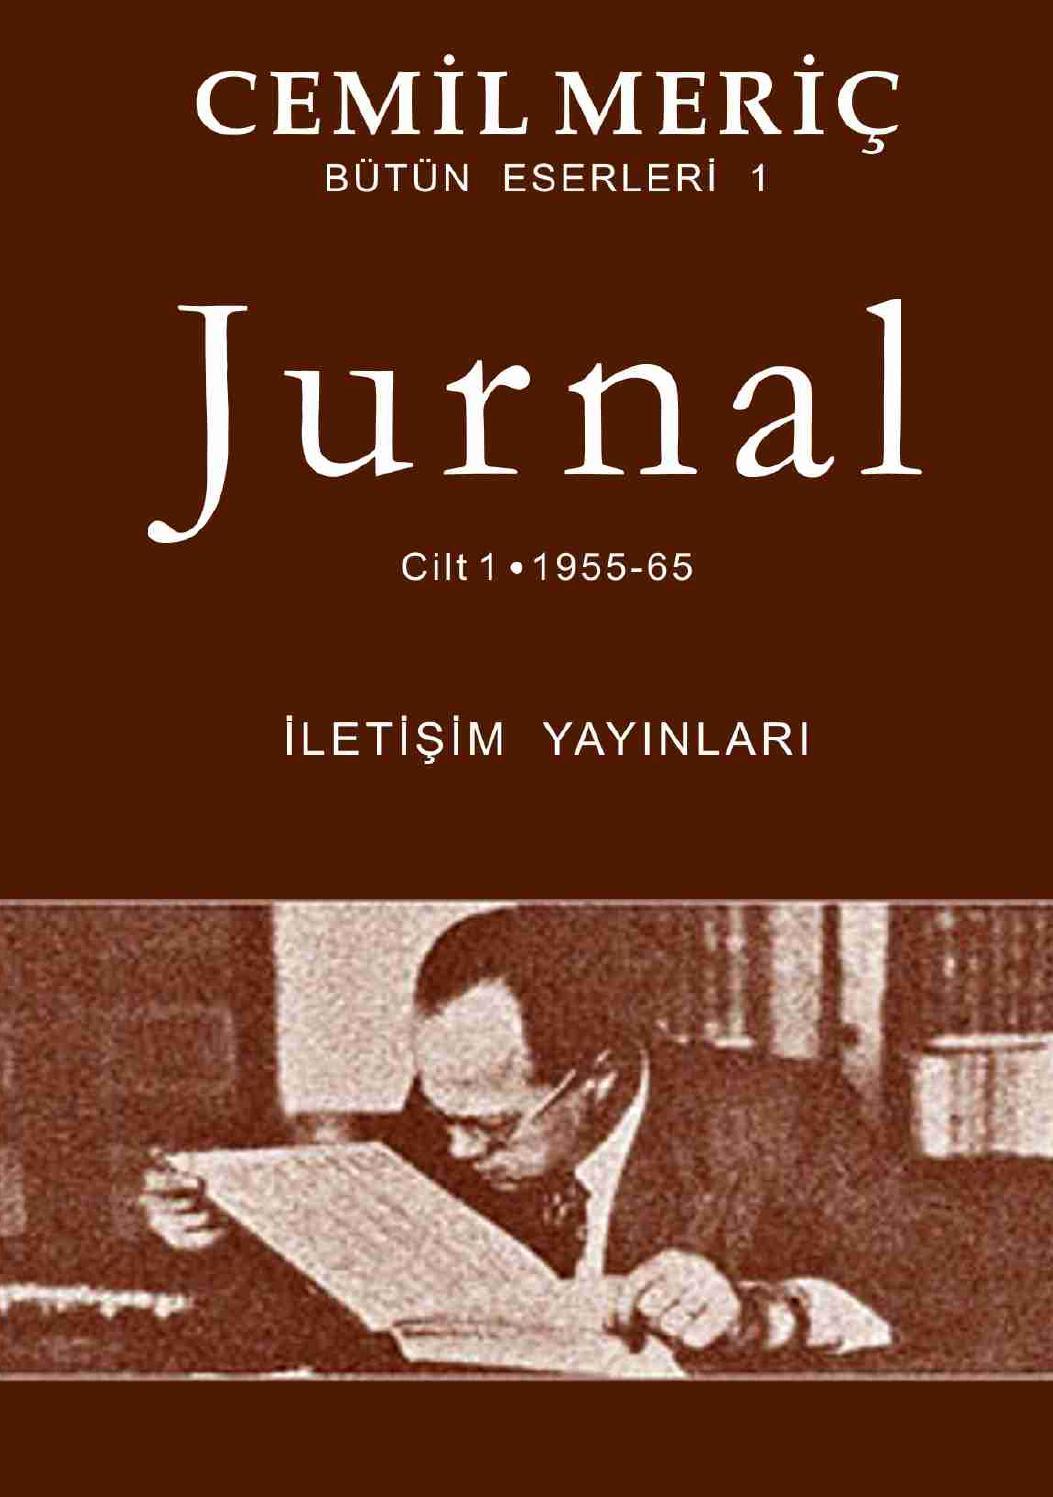 Cemil Meriç - Jurnal By Fikir Kalesi - Issuu destiné Jeux De Tir 2